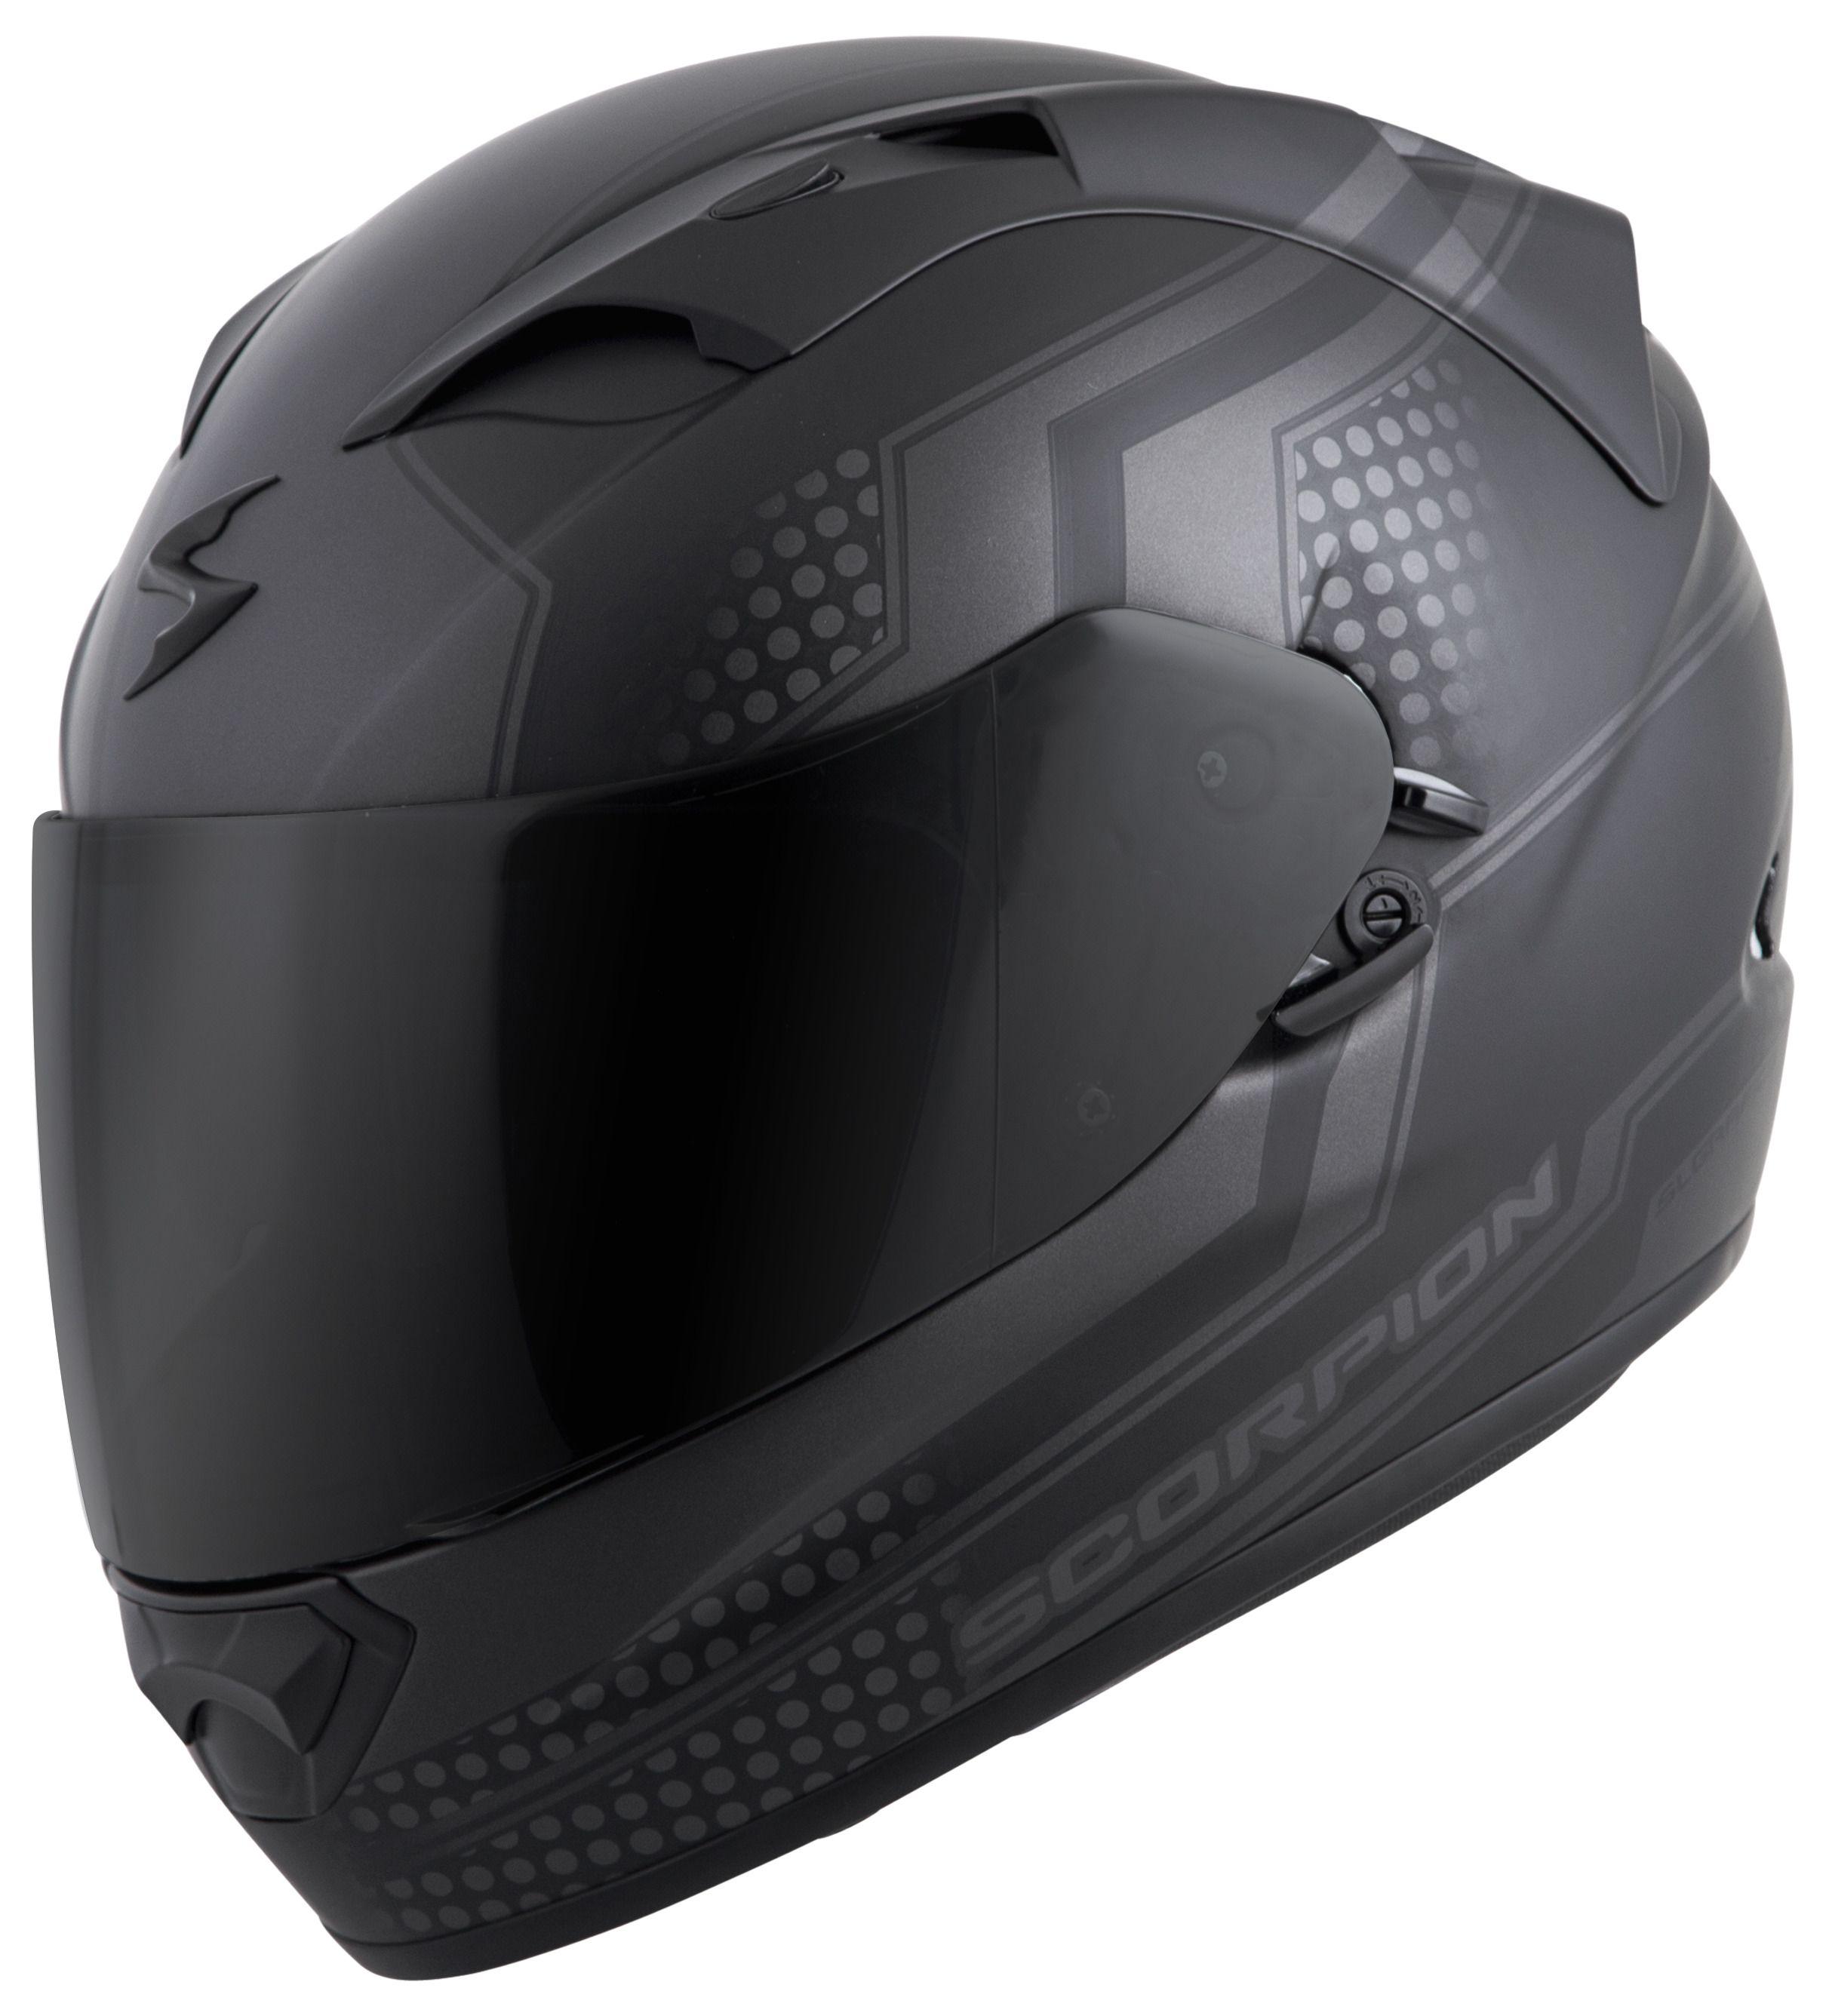 Scorpion Motorcycle Helmets >> Scorpion Exo T1200 Alias Helmet 20 63 99 Off Revzilla